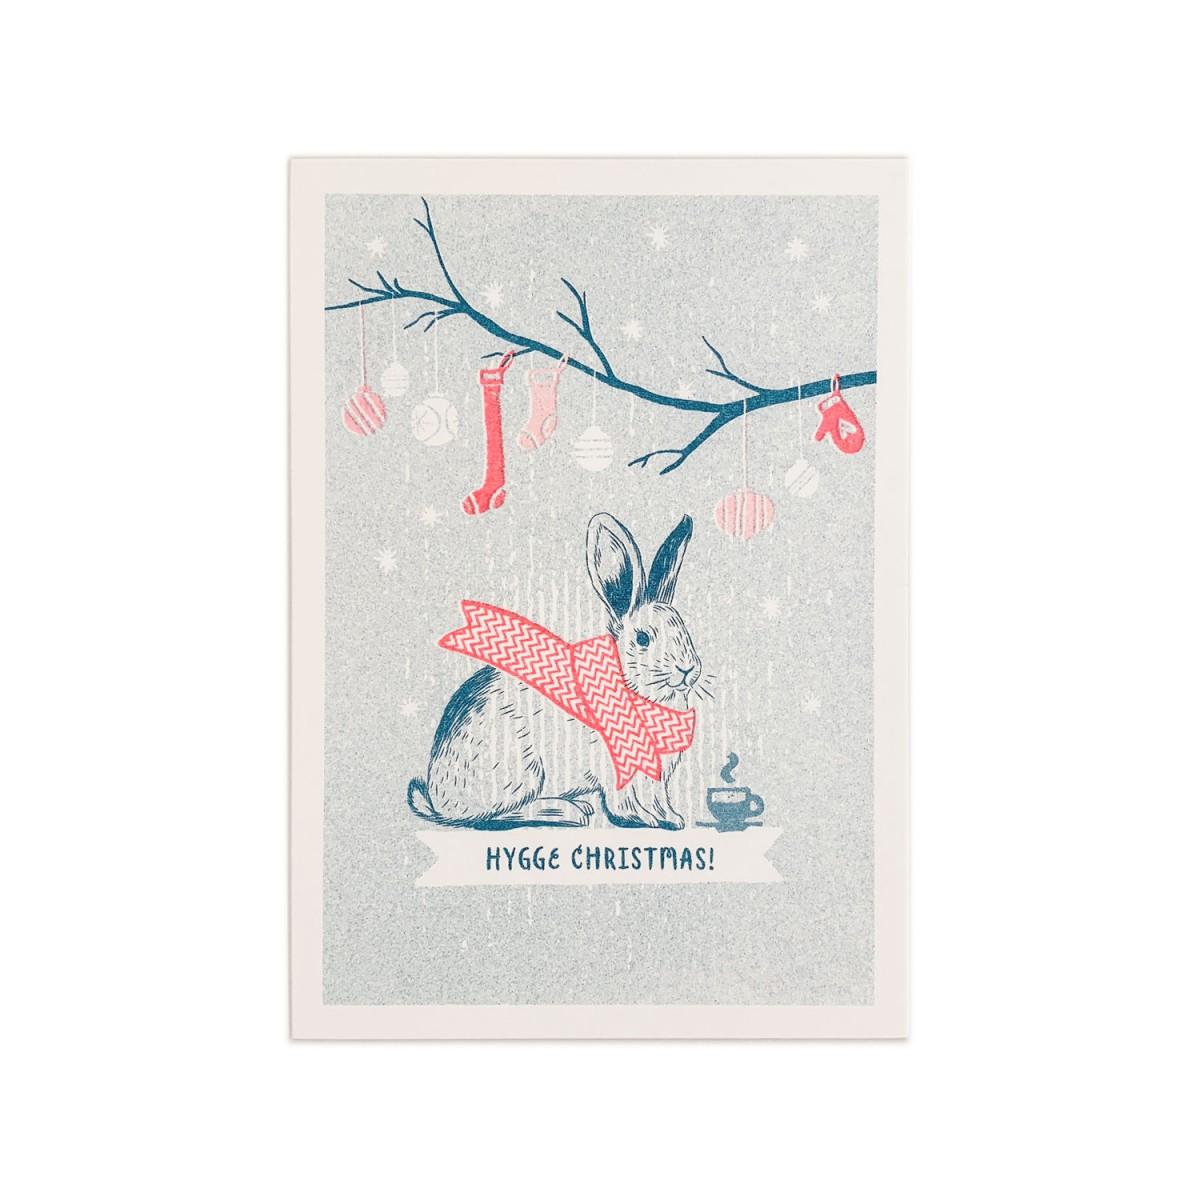 Feingeladen // LOVELY BEASTS // Bunny »Hygge Christmas!« (TLFR) // RISO-Klappkarte, A6